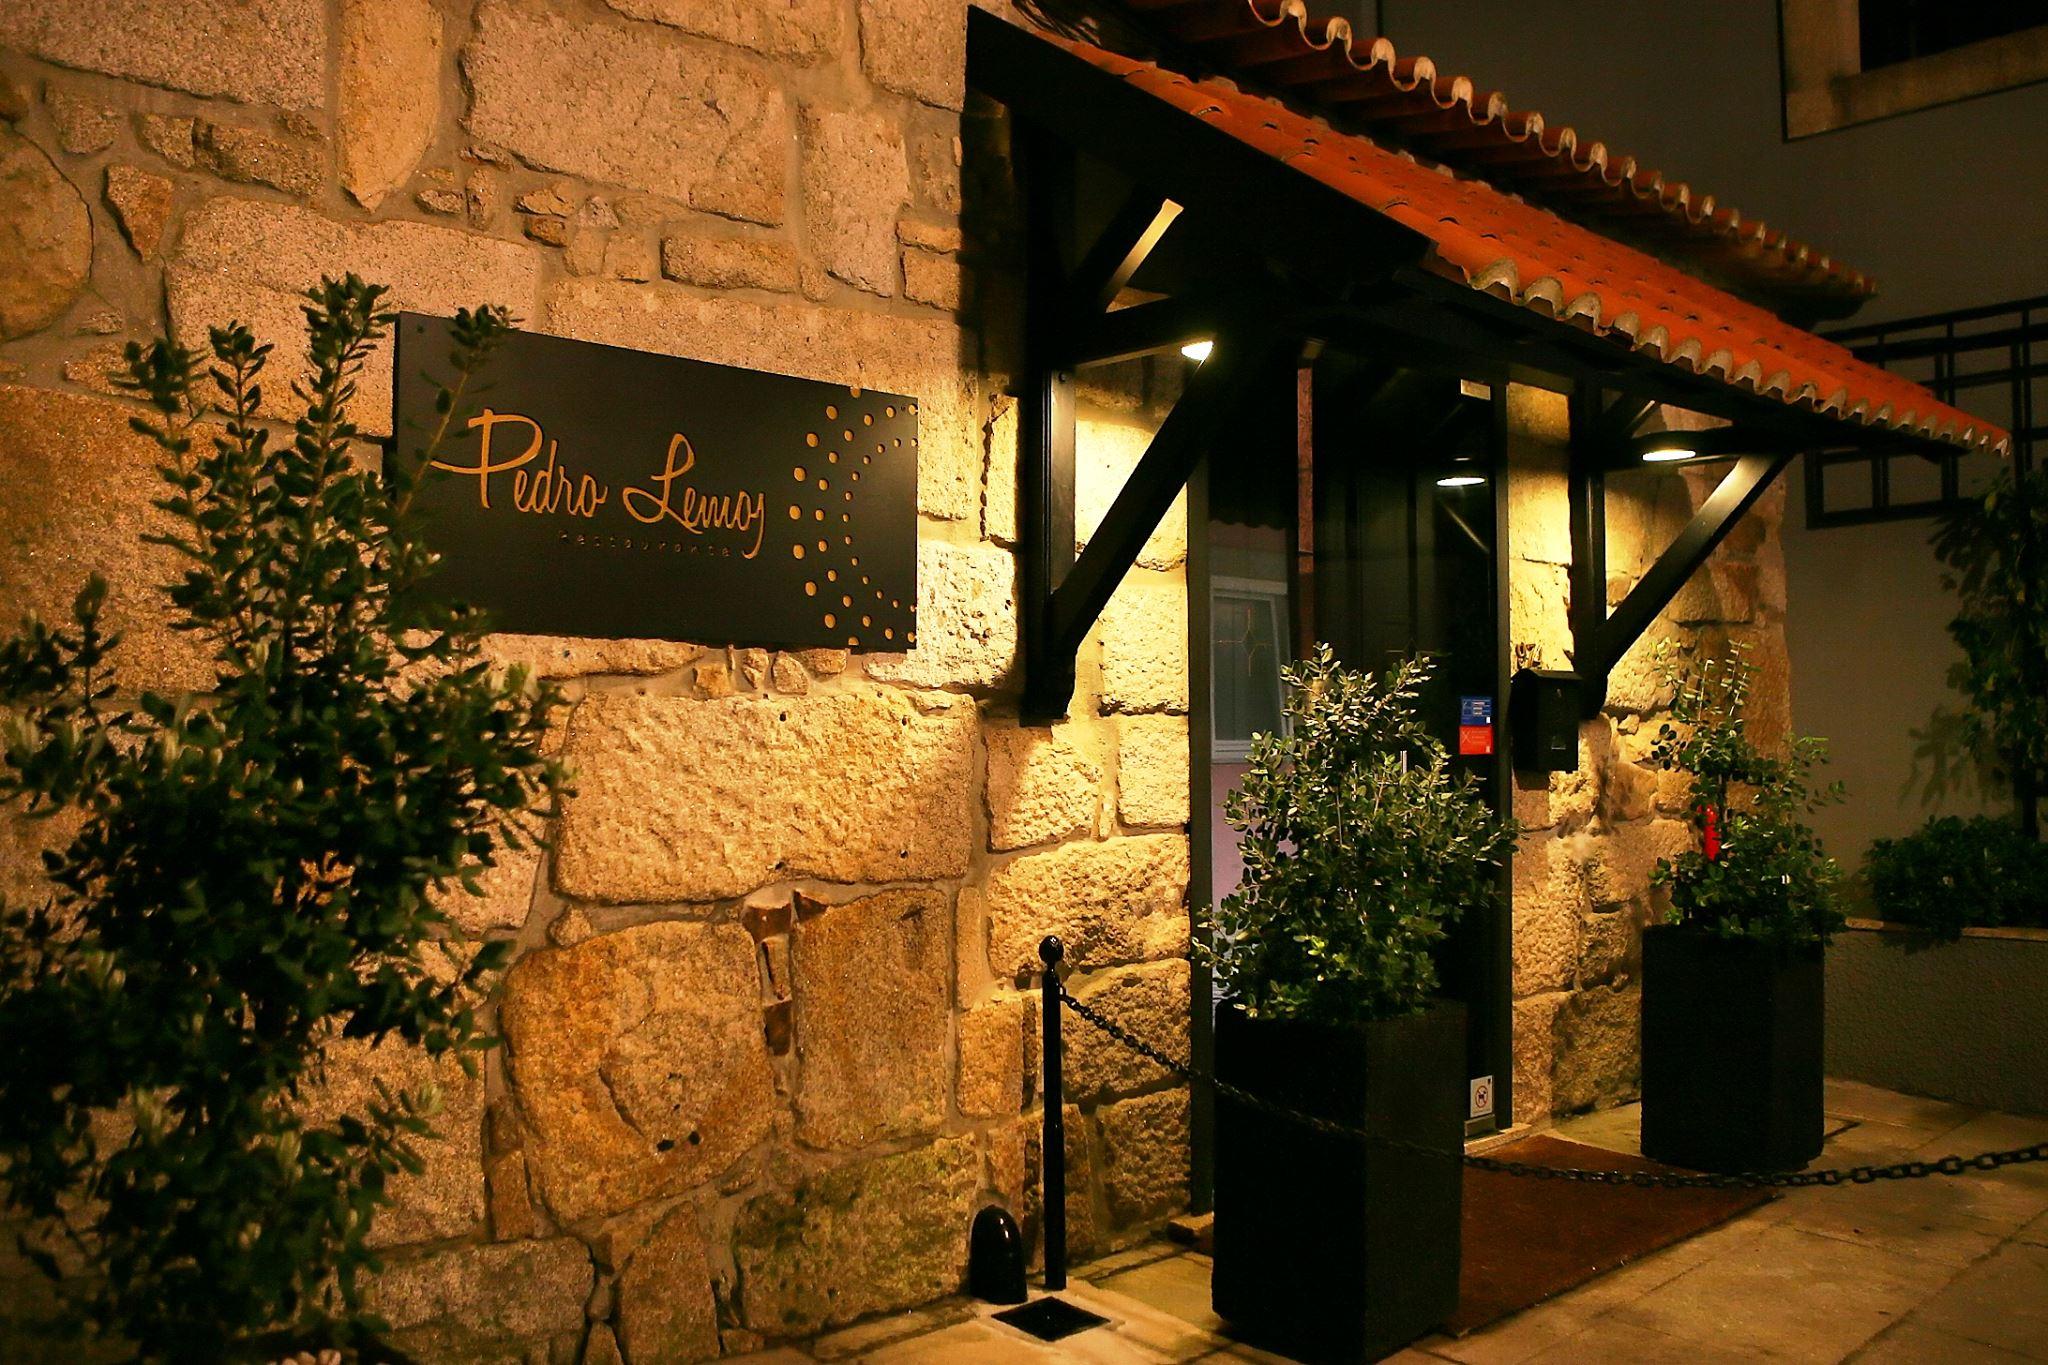 Entree Restaurant Pedro Lemos - 1 etoile Guide Michelin - Porto